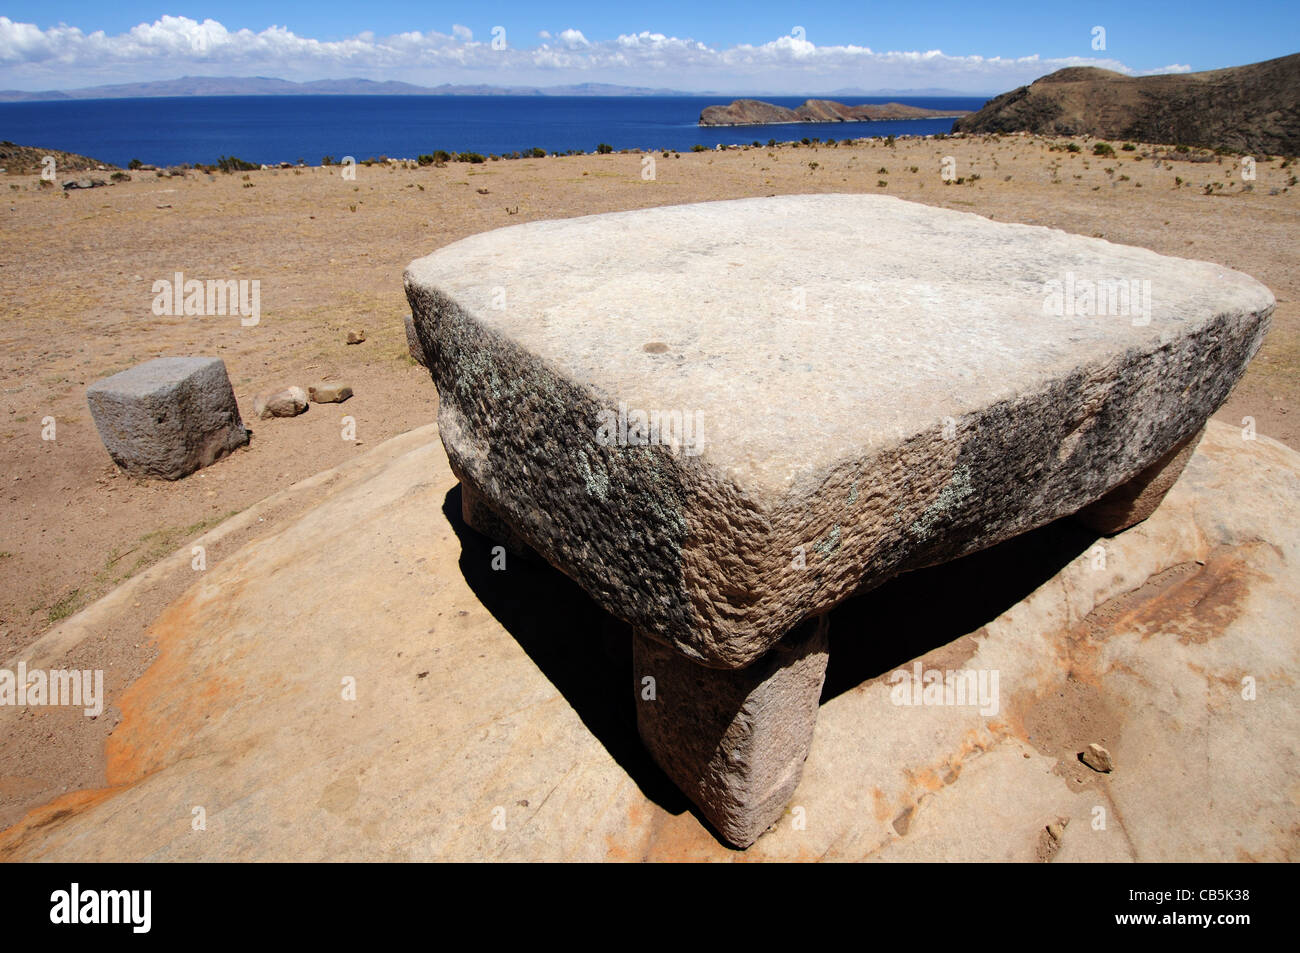 A stone table used for human sacrifice on Isla del Sol in Lake Titicaca, Bolivia Stock Photo